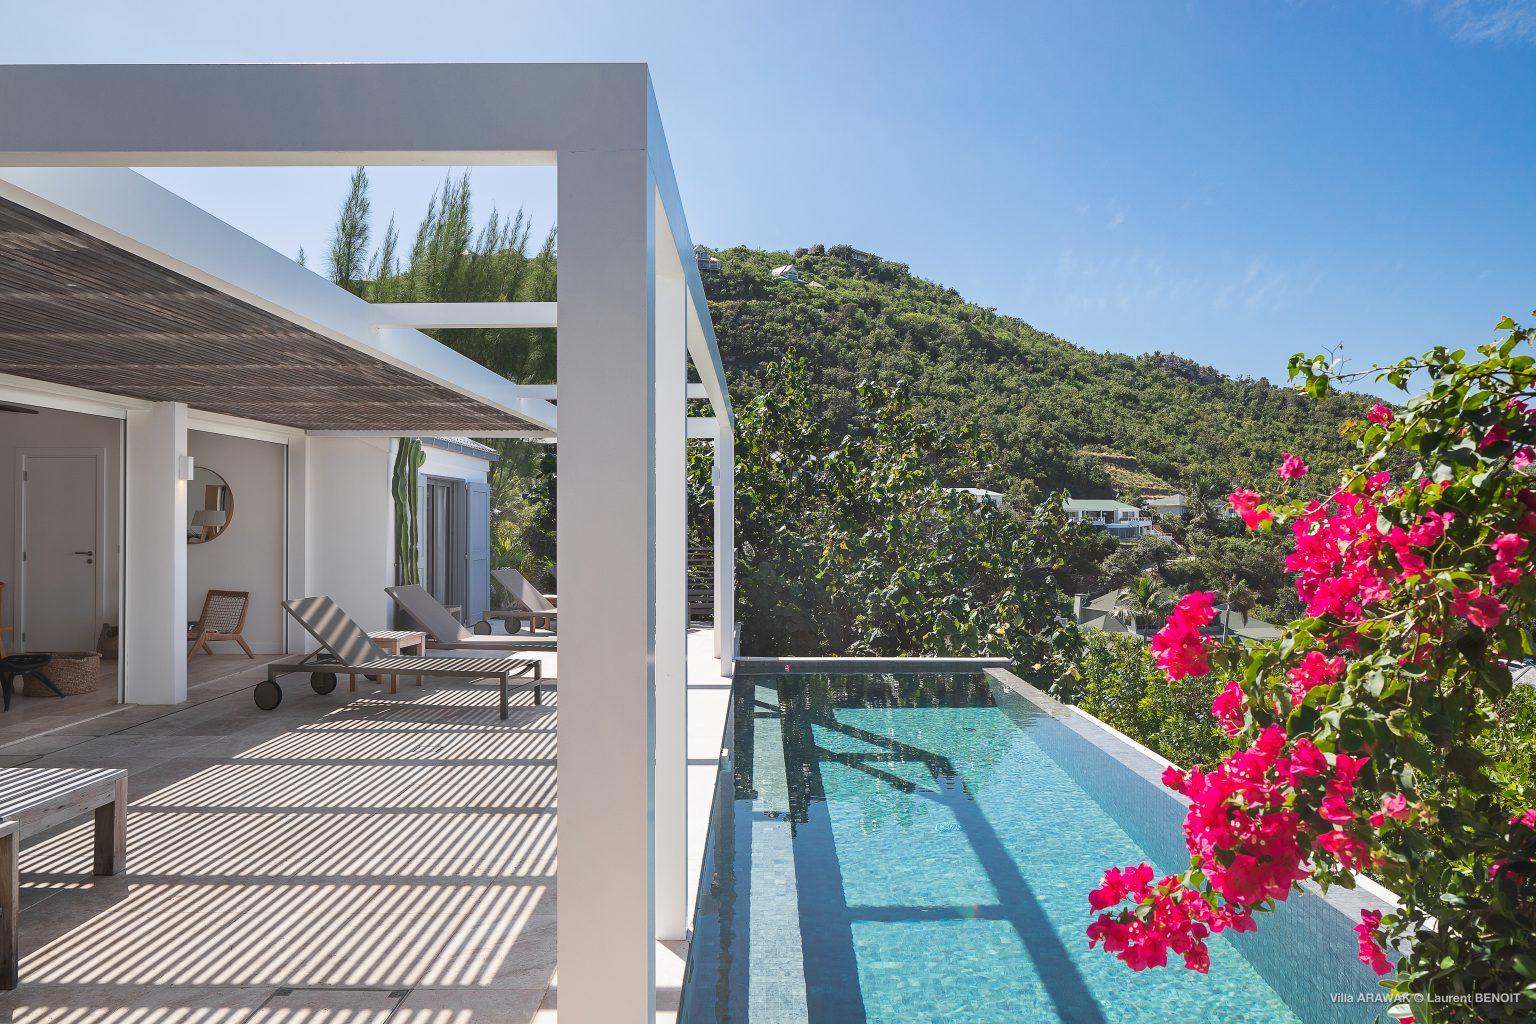 Villa Arawak - Modern and Elegant Villa for Rent St Barth Pointe Milou - Pool